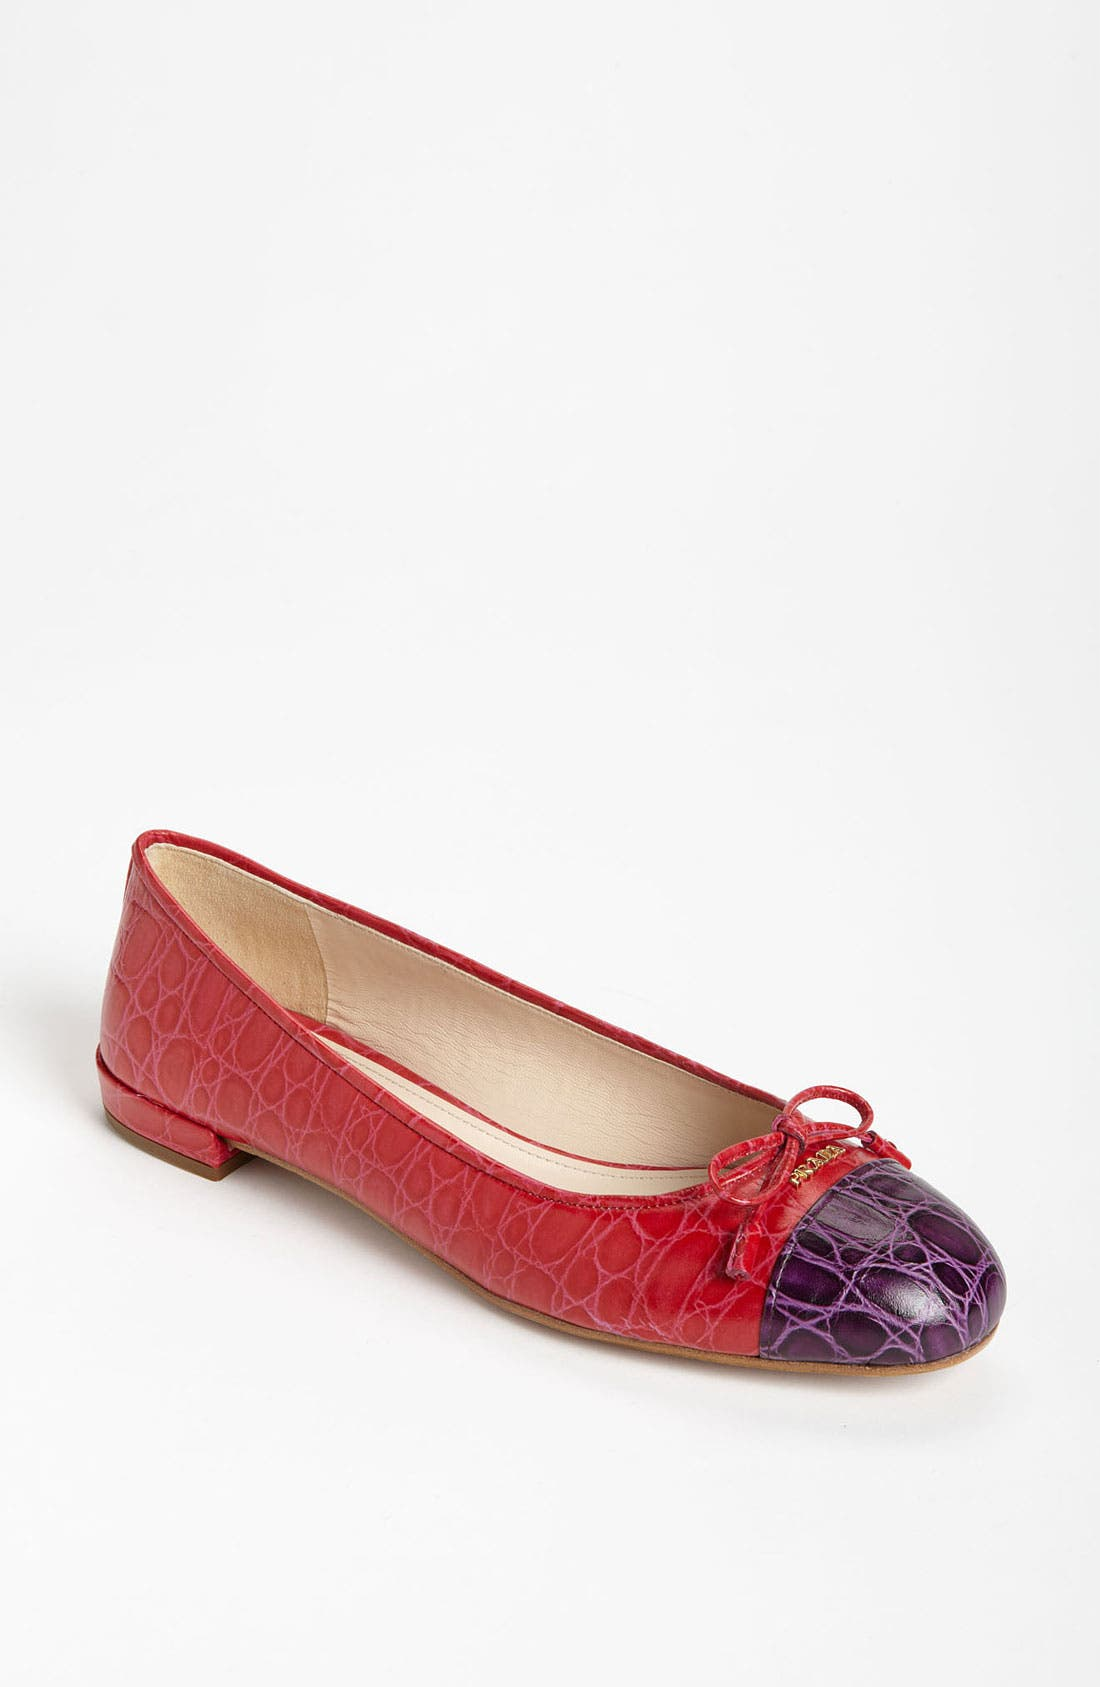 Main Image - Prada Croco Cap Toe Ballet Flat